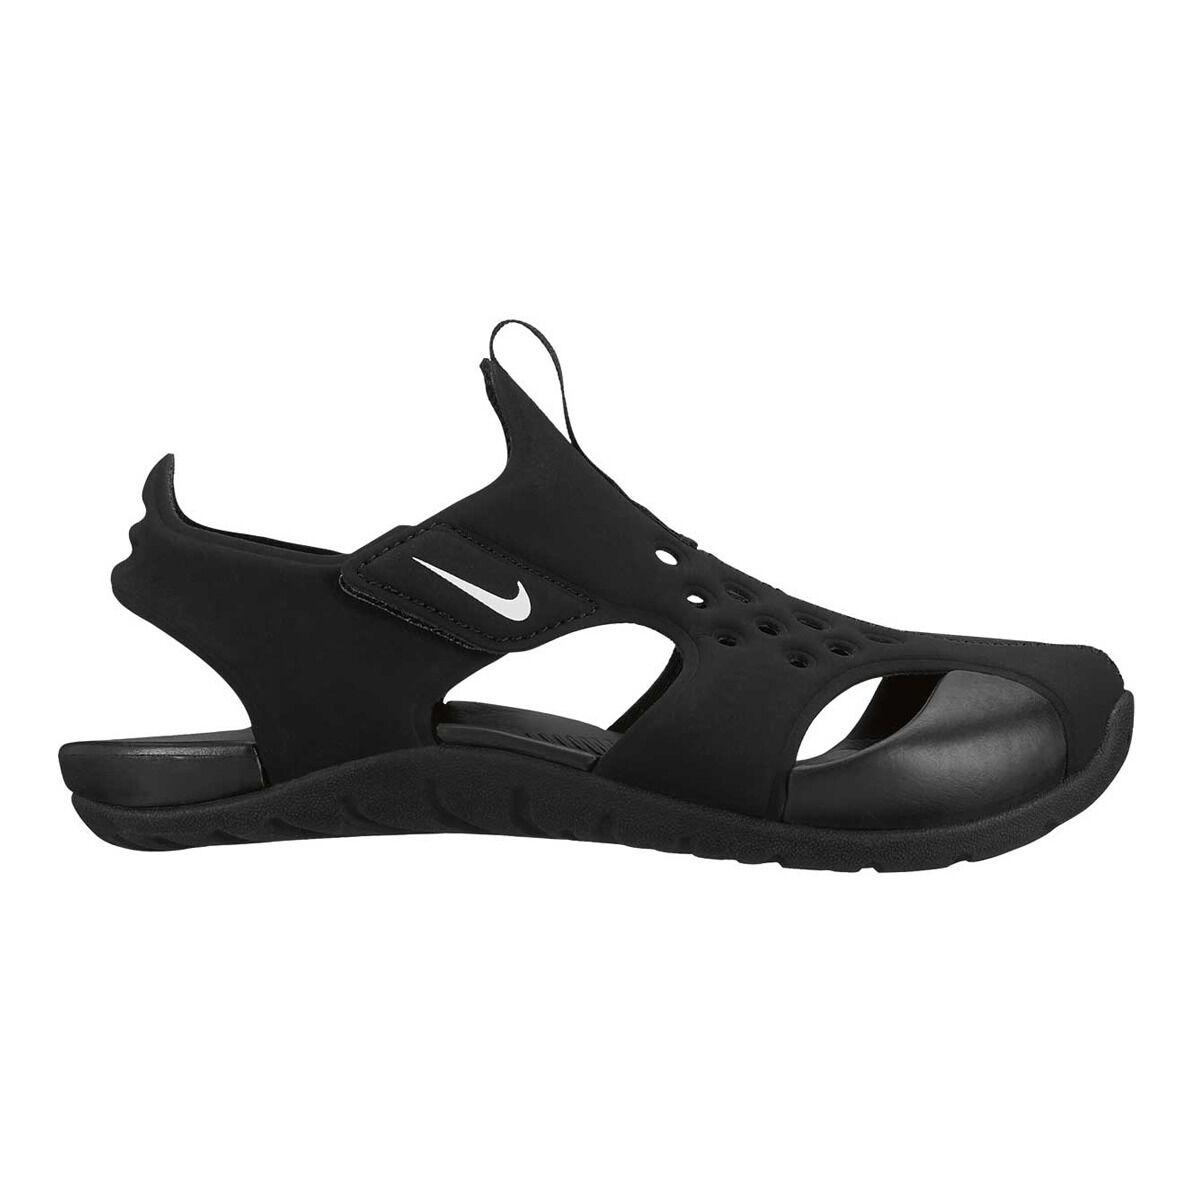 Us 2 3 Kids White Sunray Black Protect Nike Junior Sandals 4R5jLA